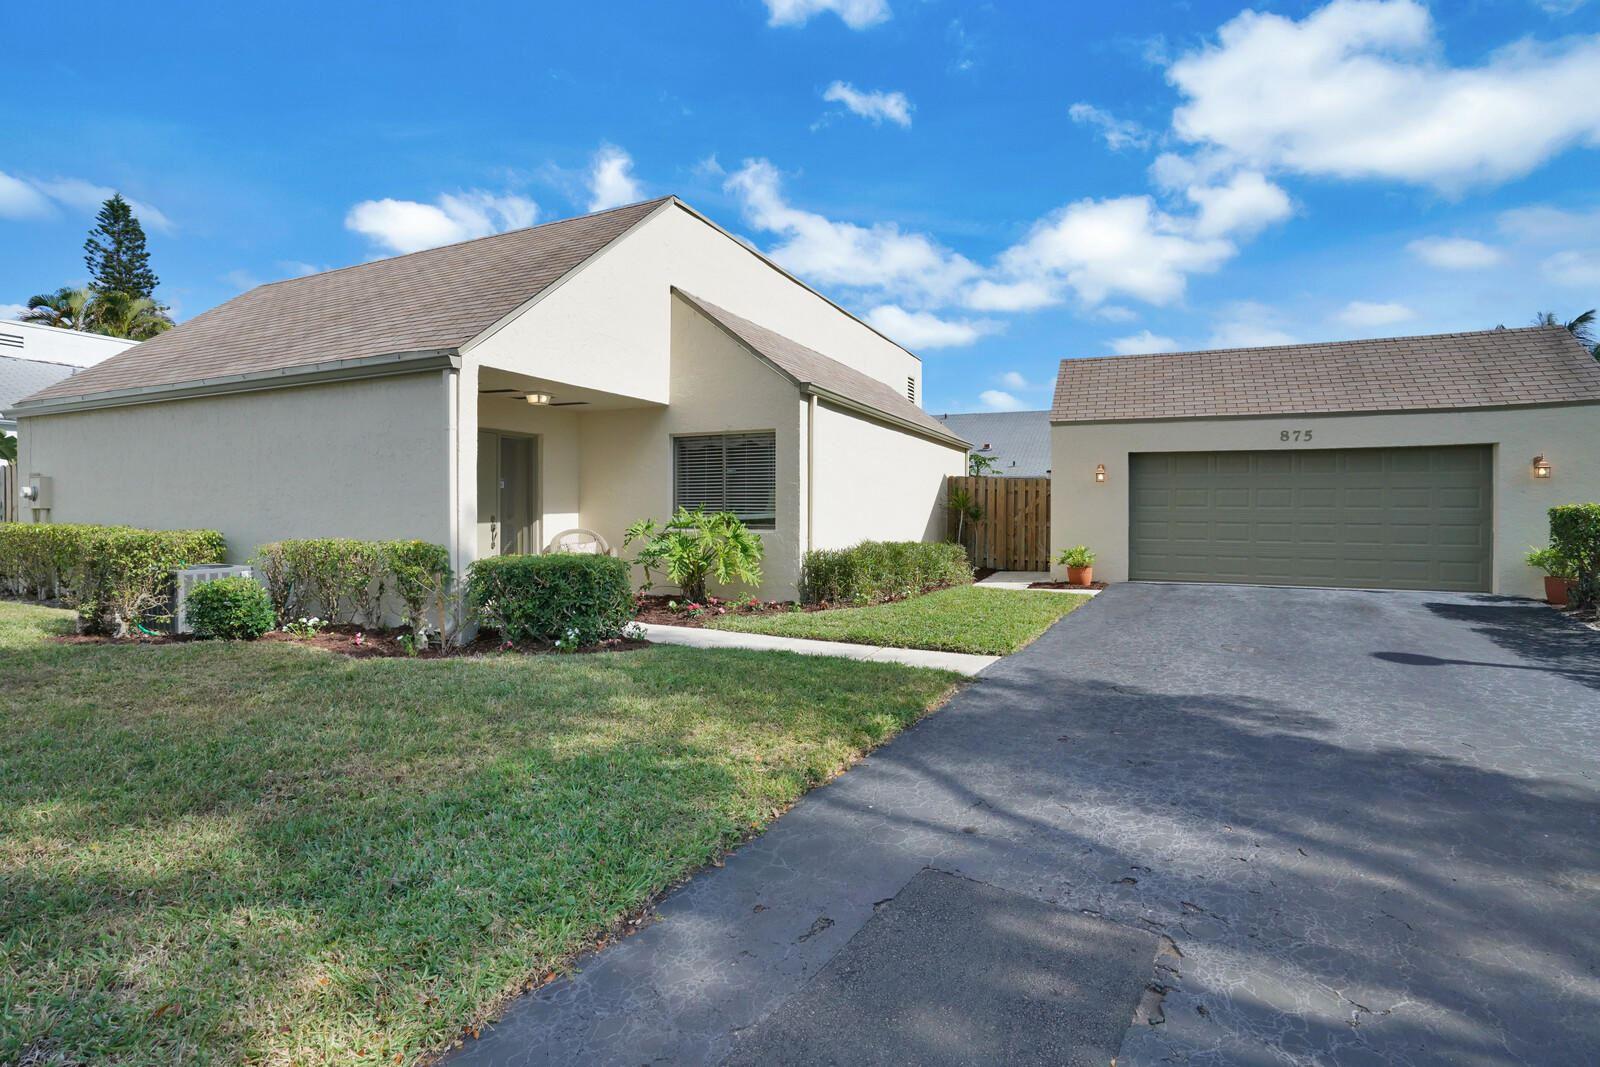 875 NW 22nd Avenue, Delray Beach, FL 33445 - #: RX-10685944